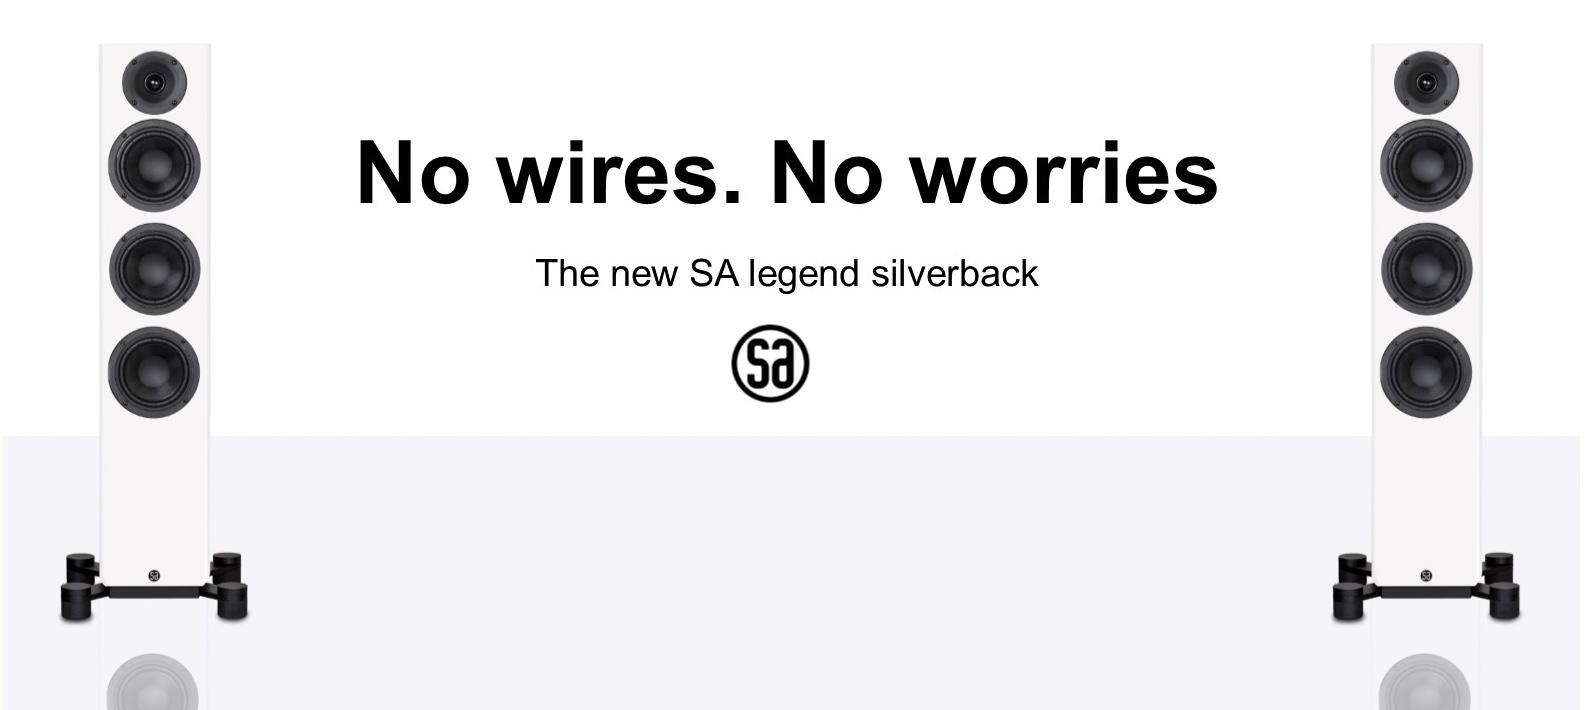 SA legend 40 silverback